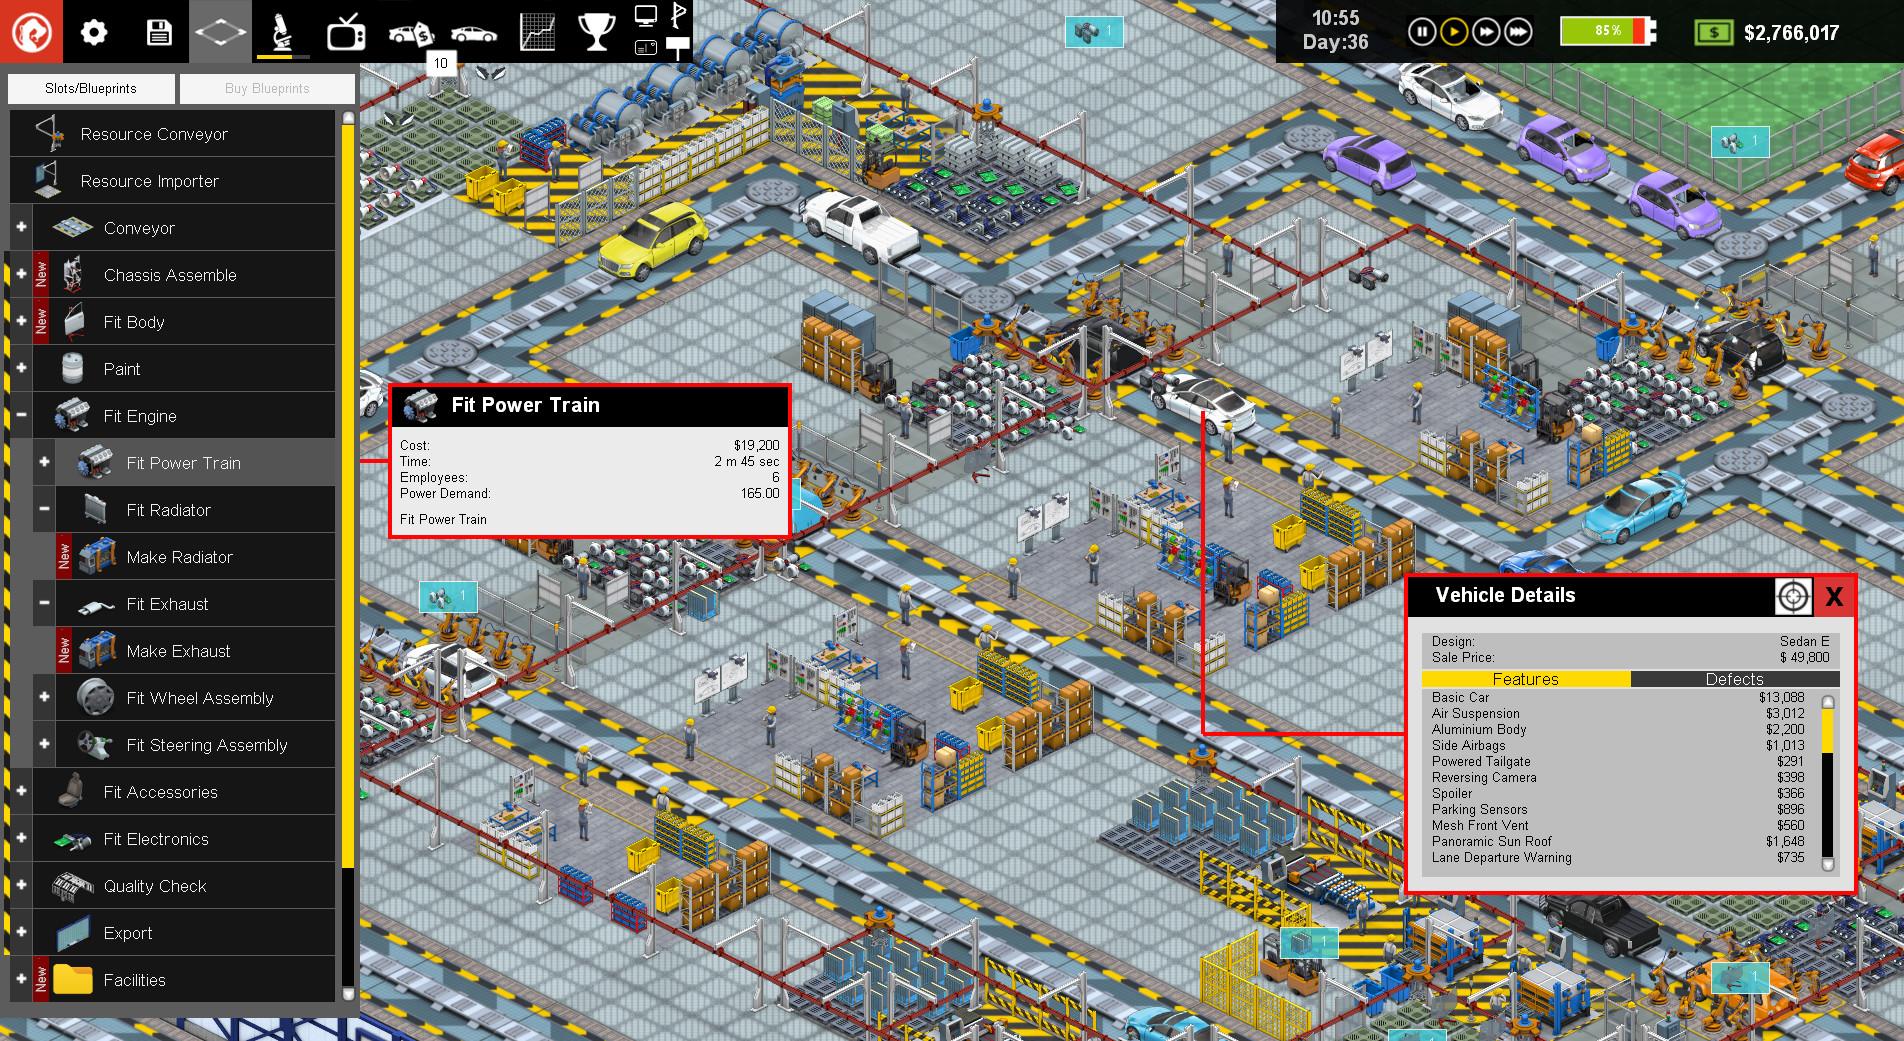 Production Line screenshot 1